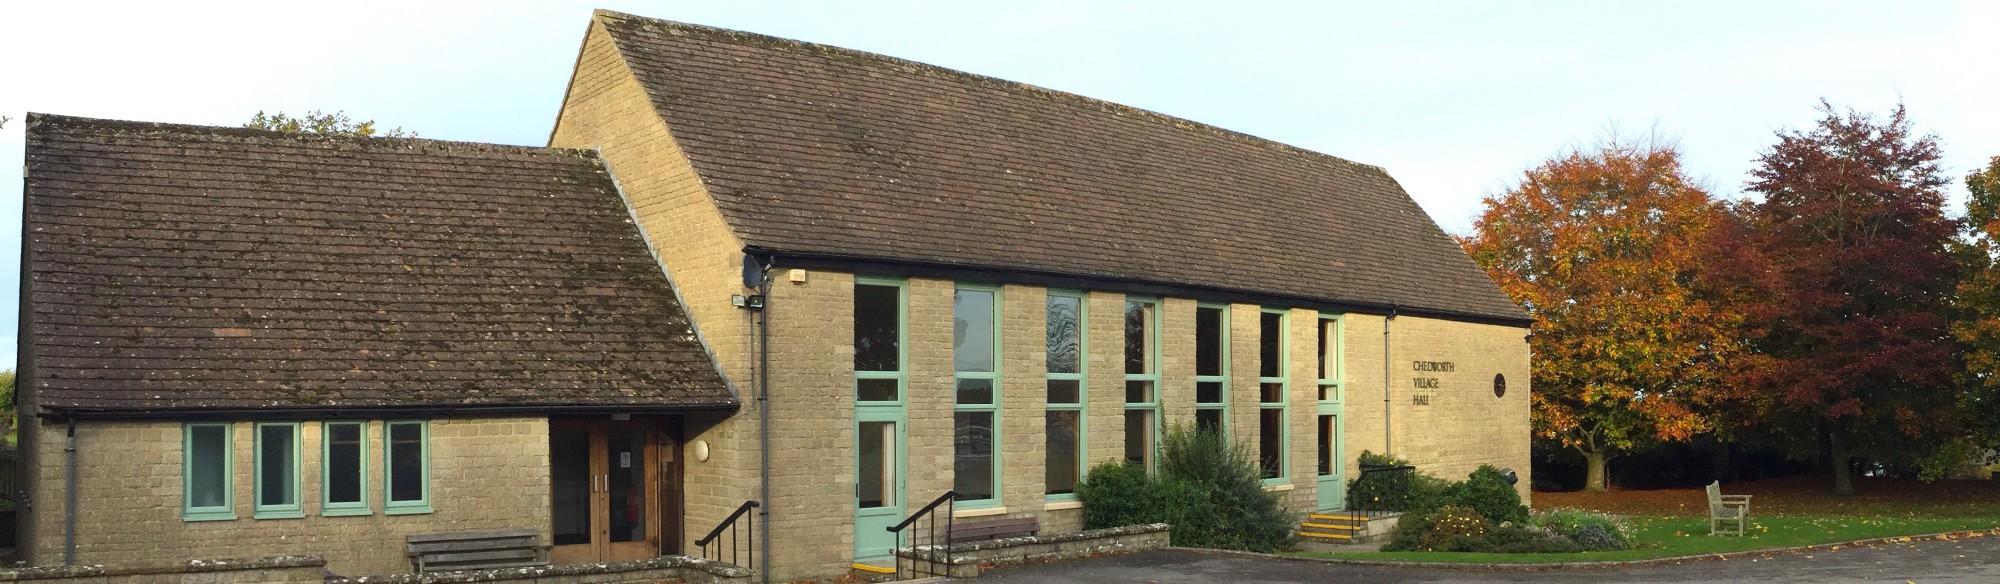 Chedworth Village Hall